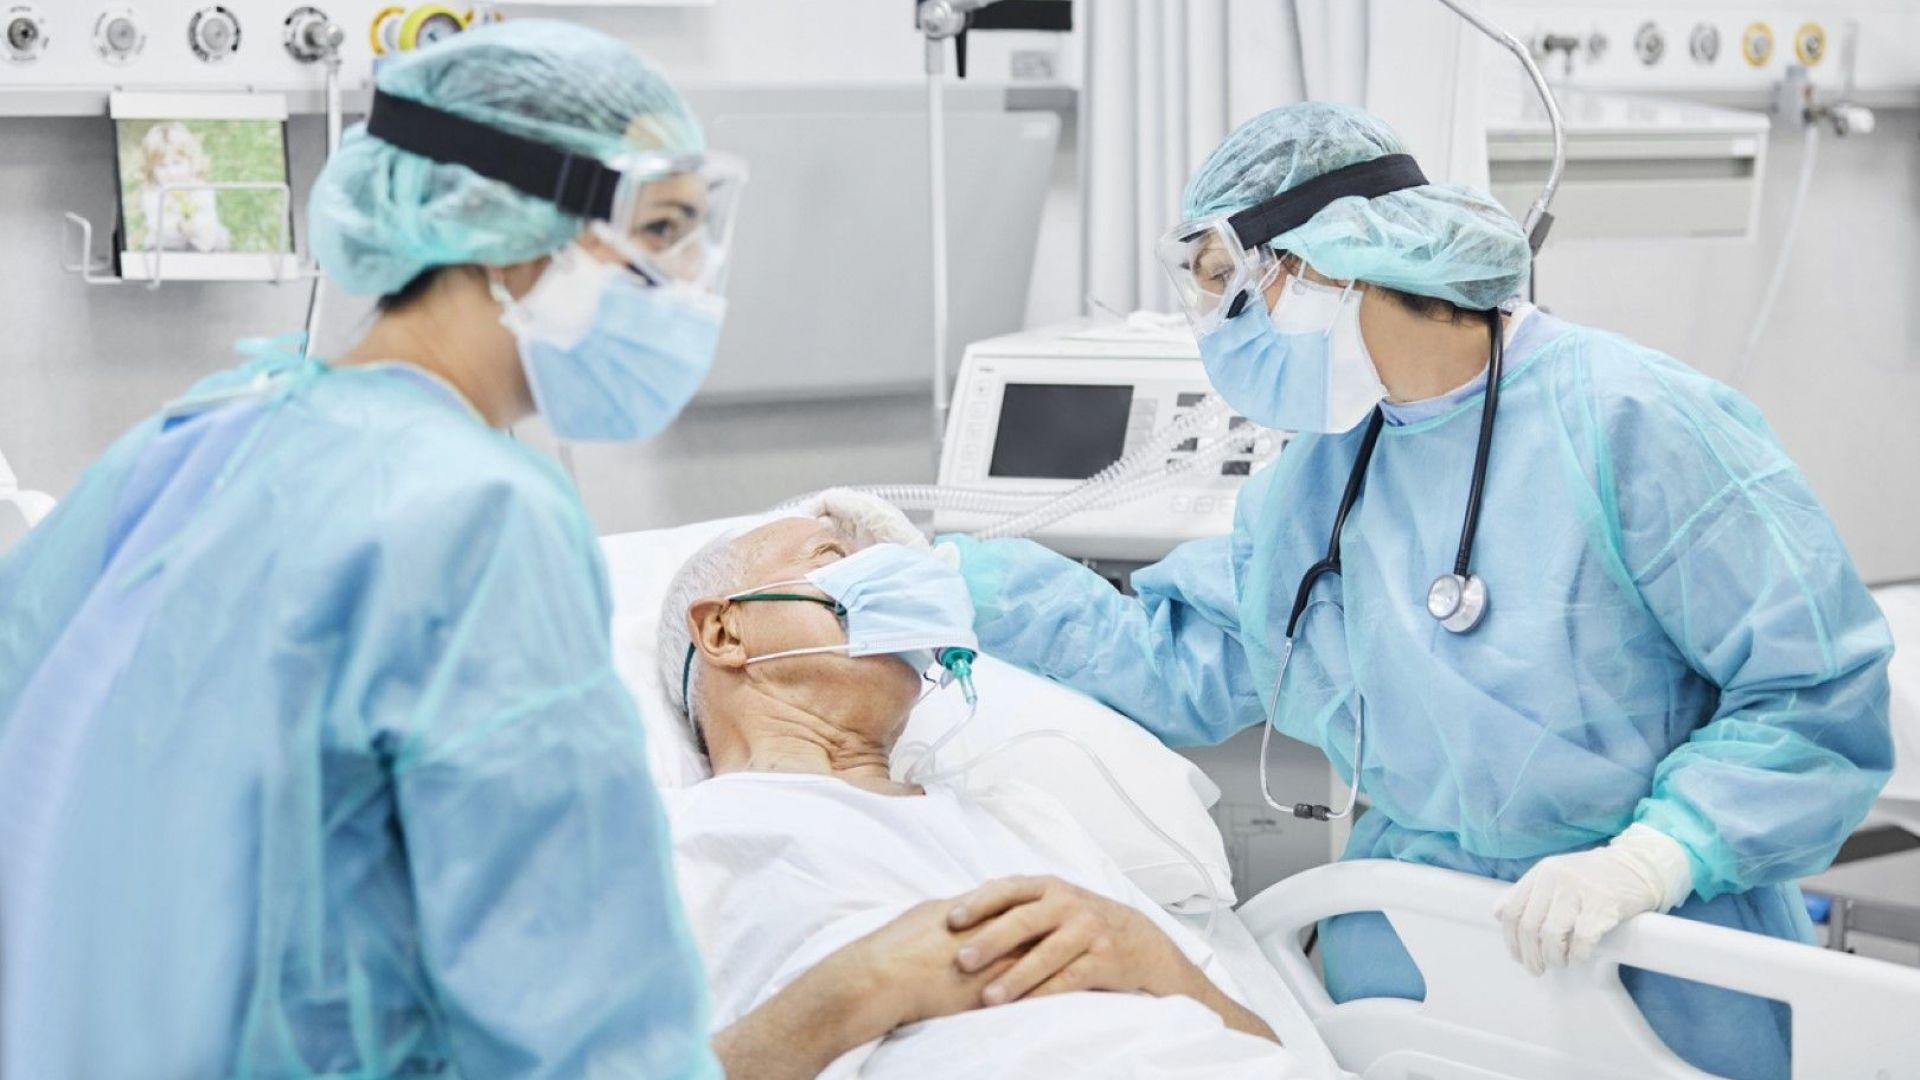 Нови близо 1600 заразени с коронавирус у нас за денонощие, 16 са починали